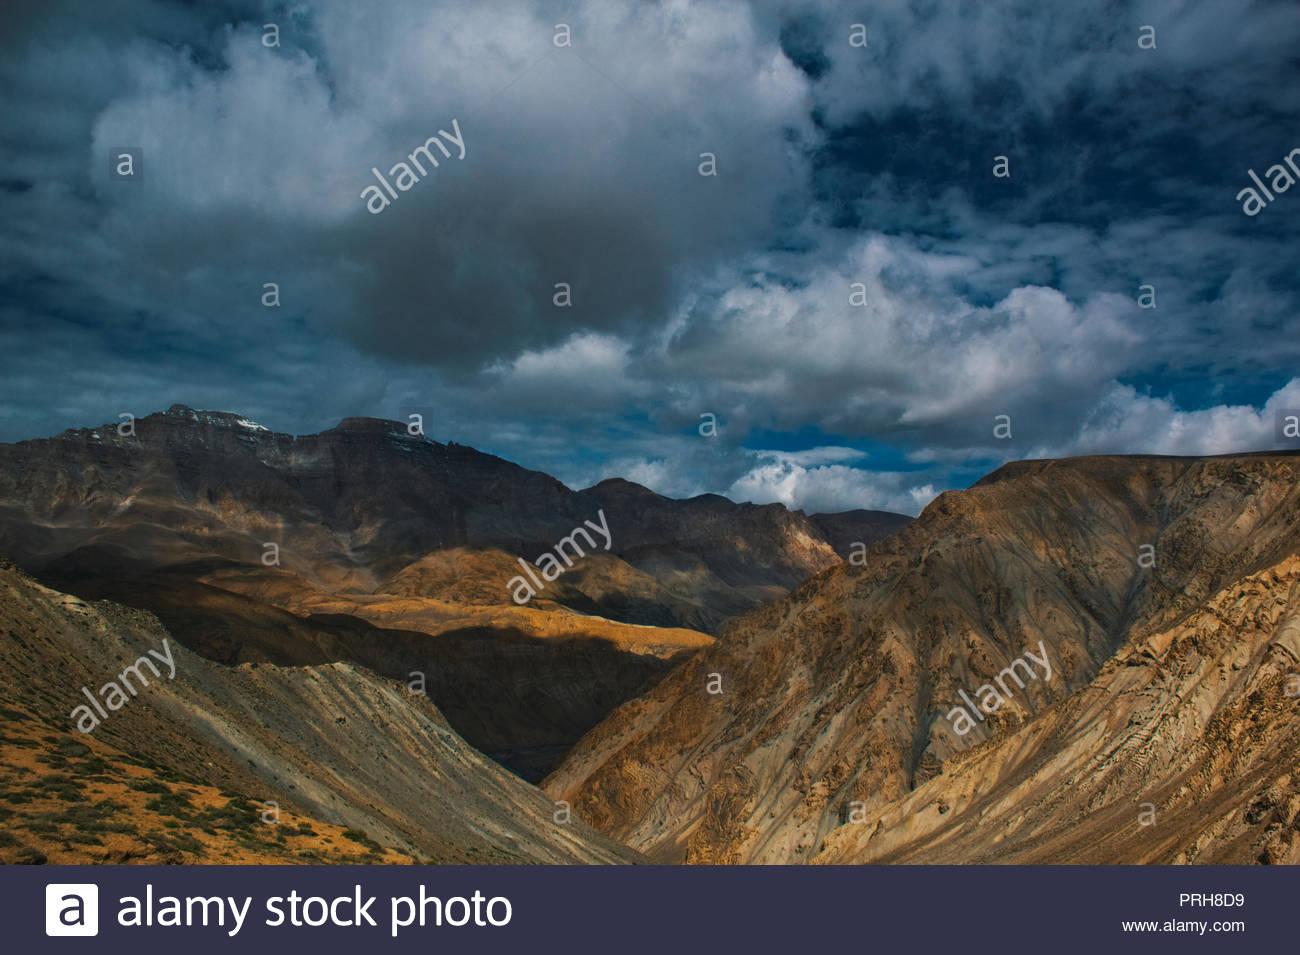 High altitude mountains of Himalayas near Pang on Leh Manali Highway. - Stock Image